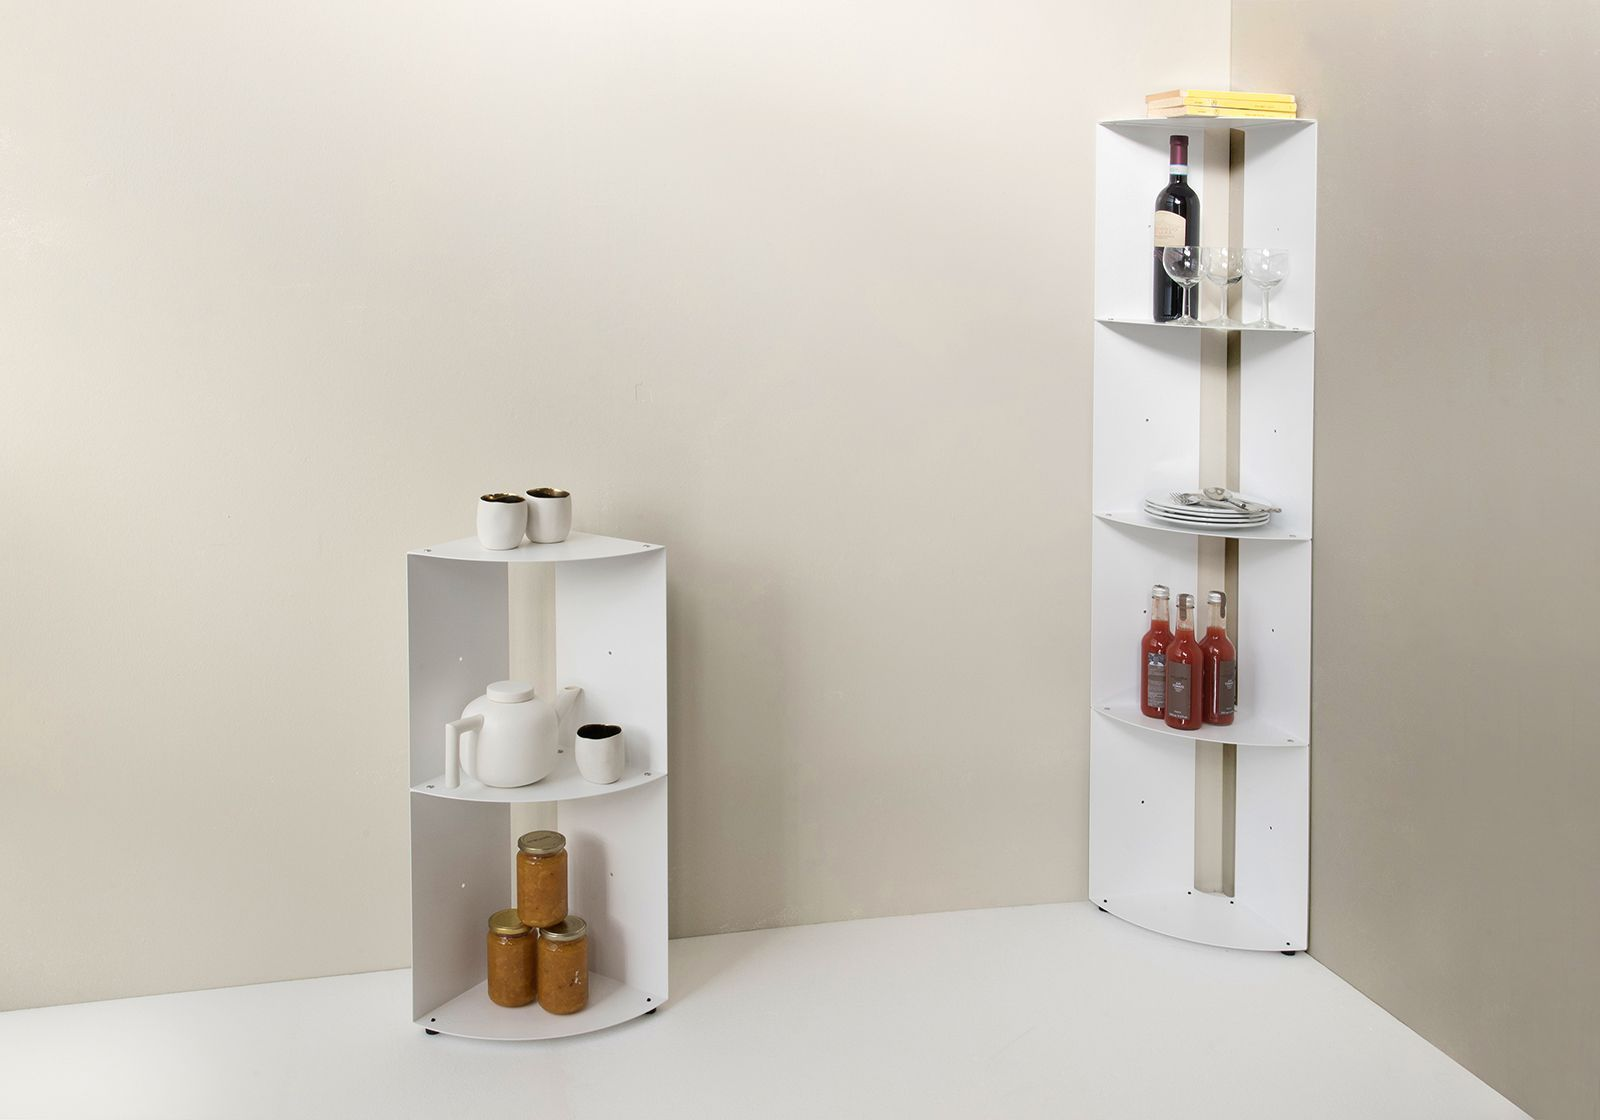 tag re d 39 angle de cuisine dangolo en m tal 25x25x70cm. Black Bedroom Furniture Sets. Home Design Ideas